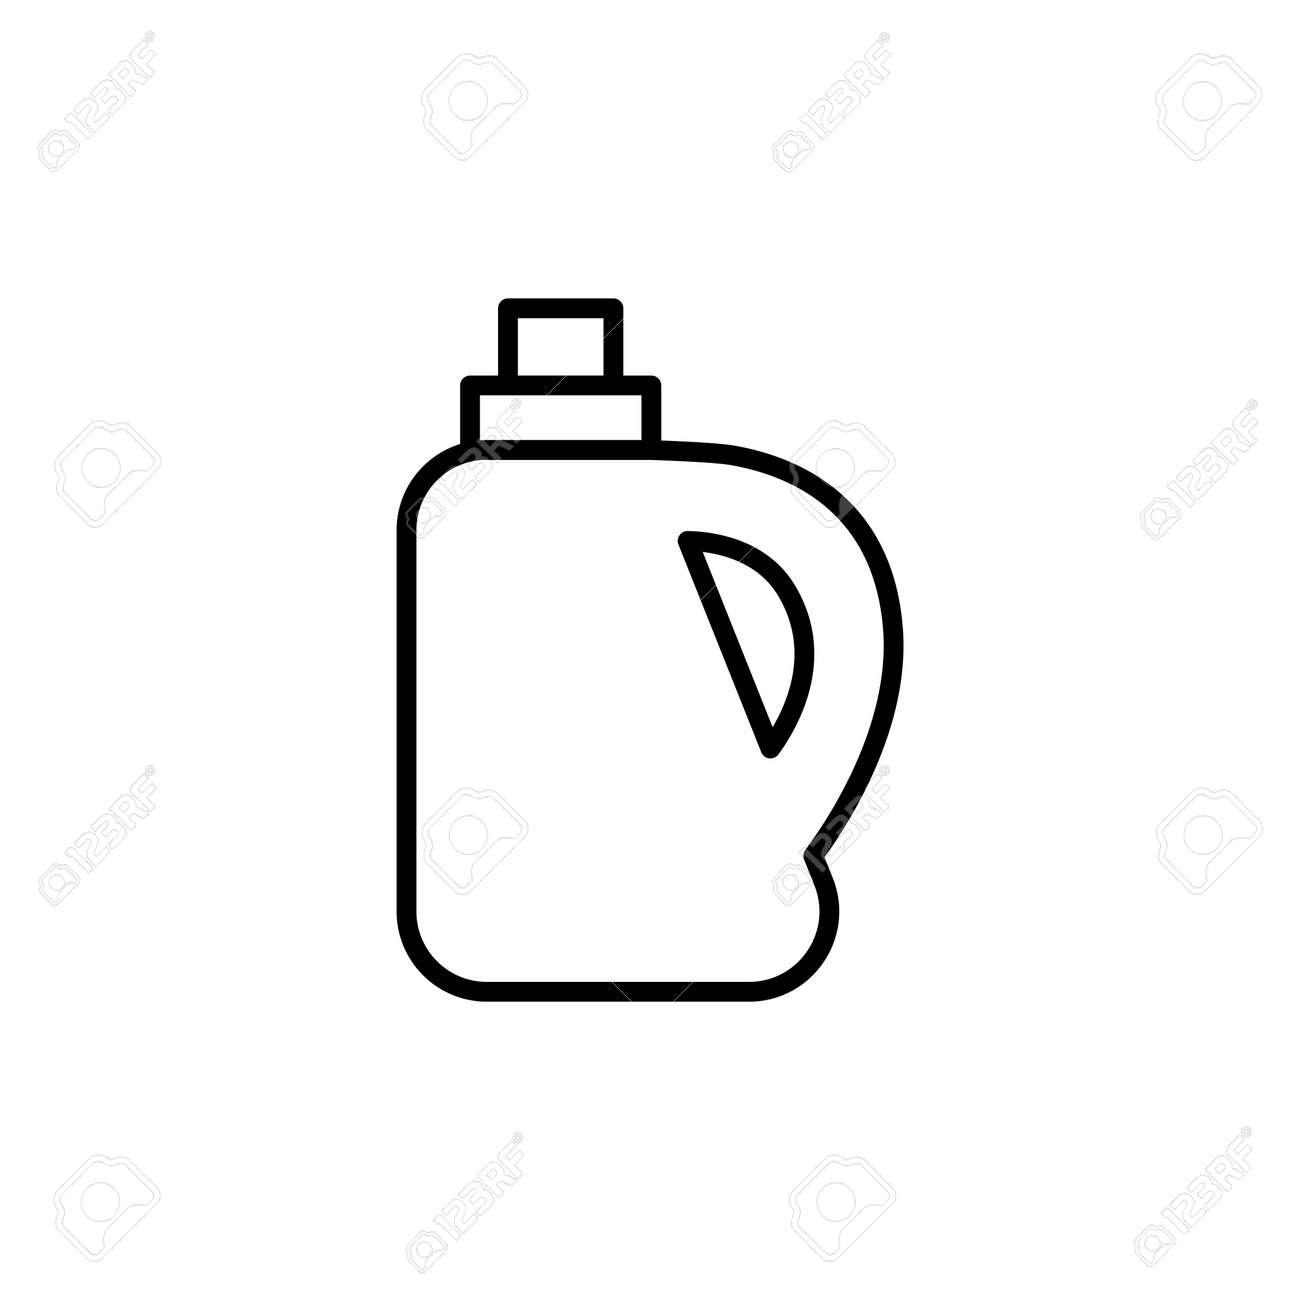 5 Gallon Water Bottle Stock Illustrations – 10 5 Gallon Water Bottle Stock  Illustrations, Vectors & Clipart - Dreamstime